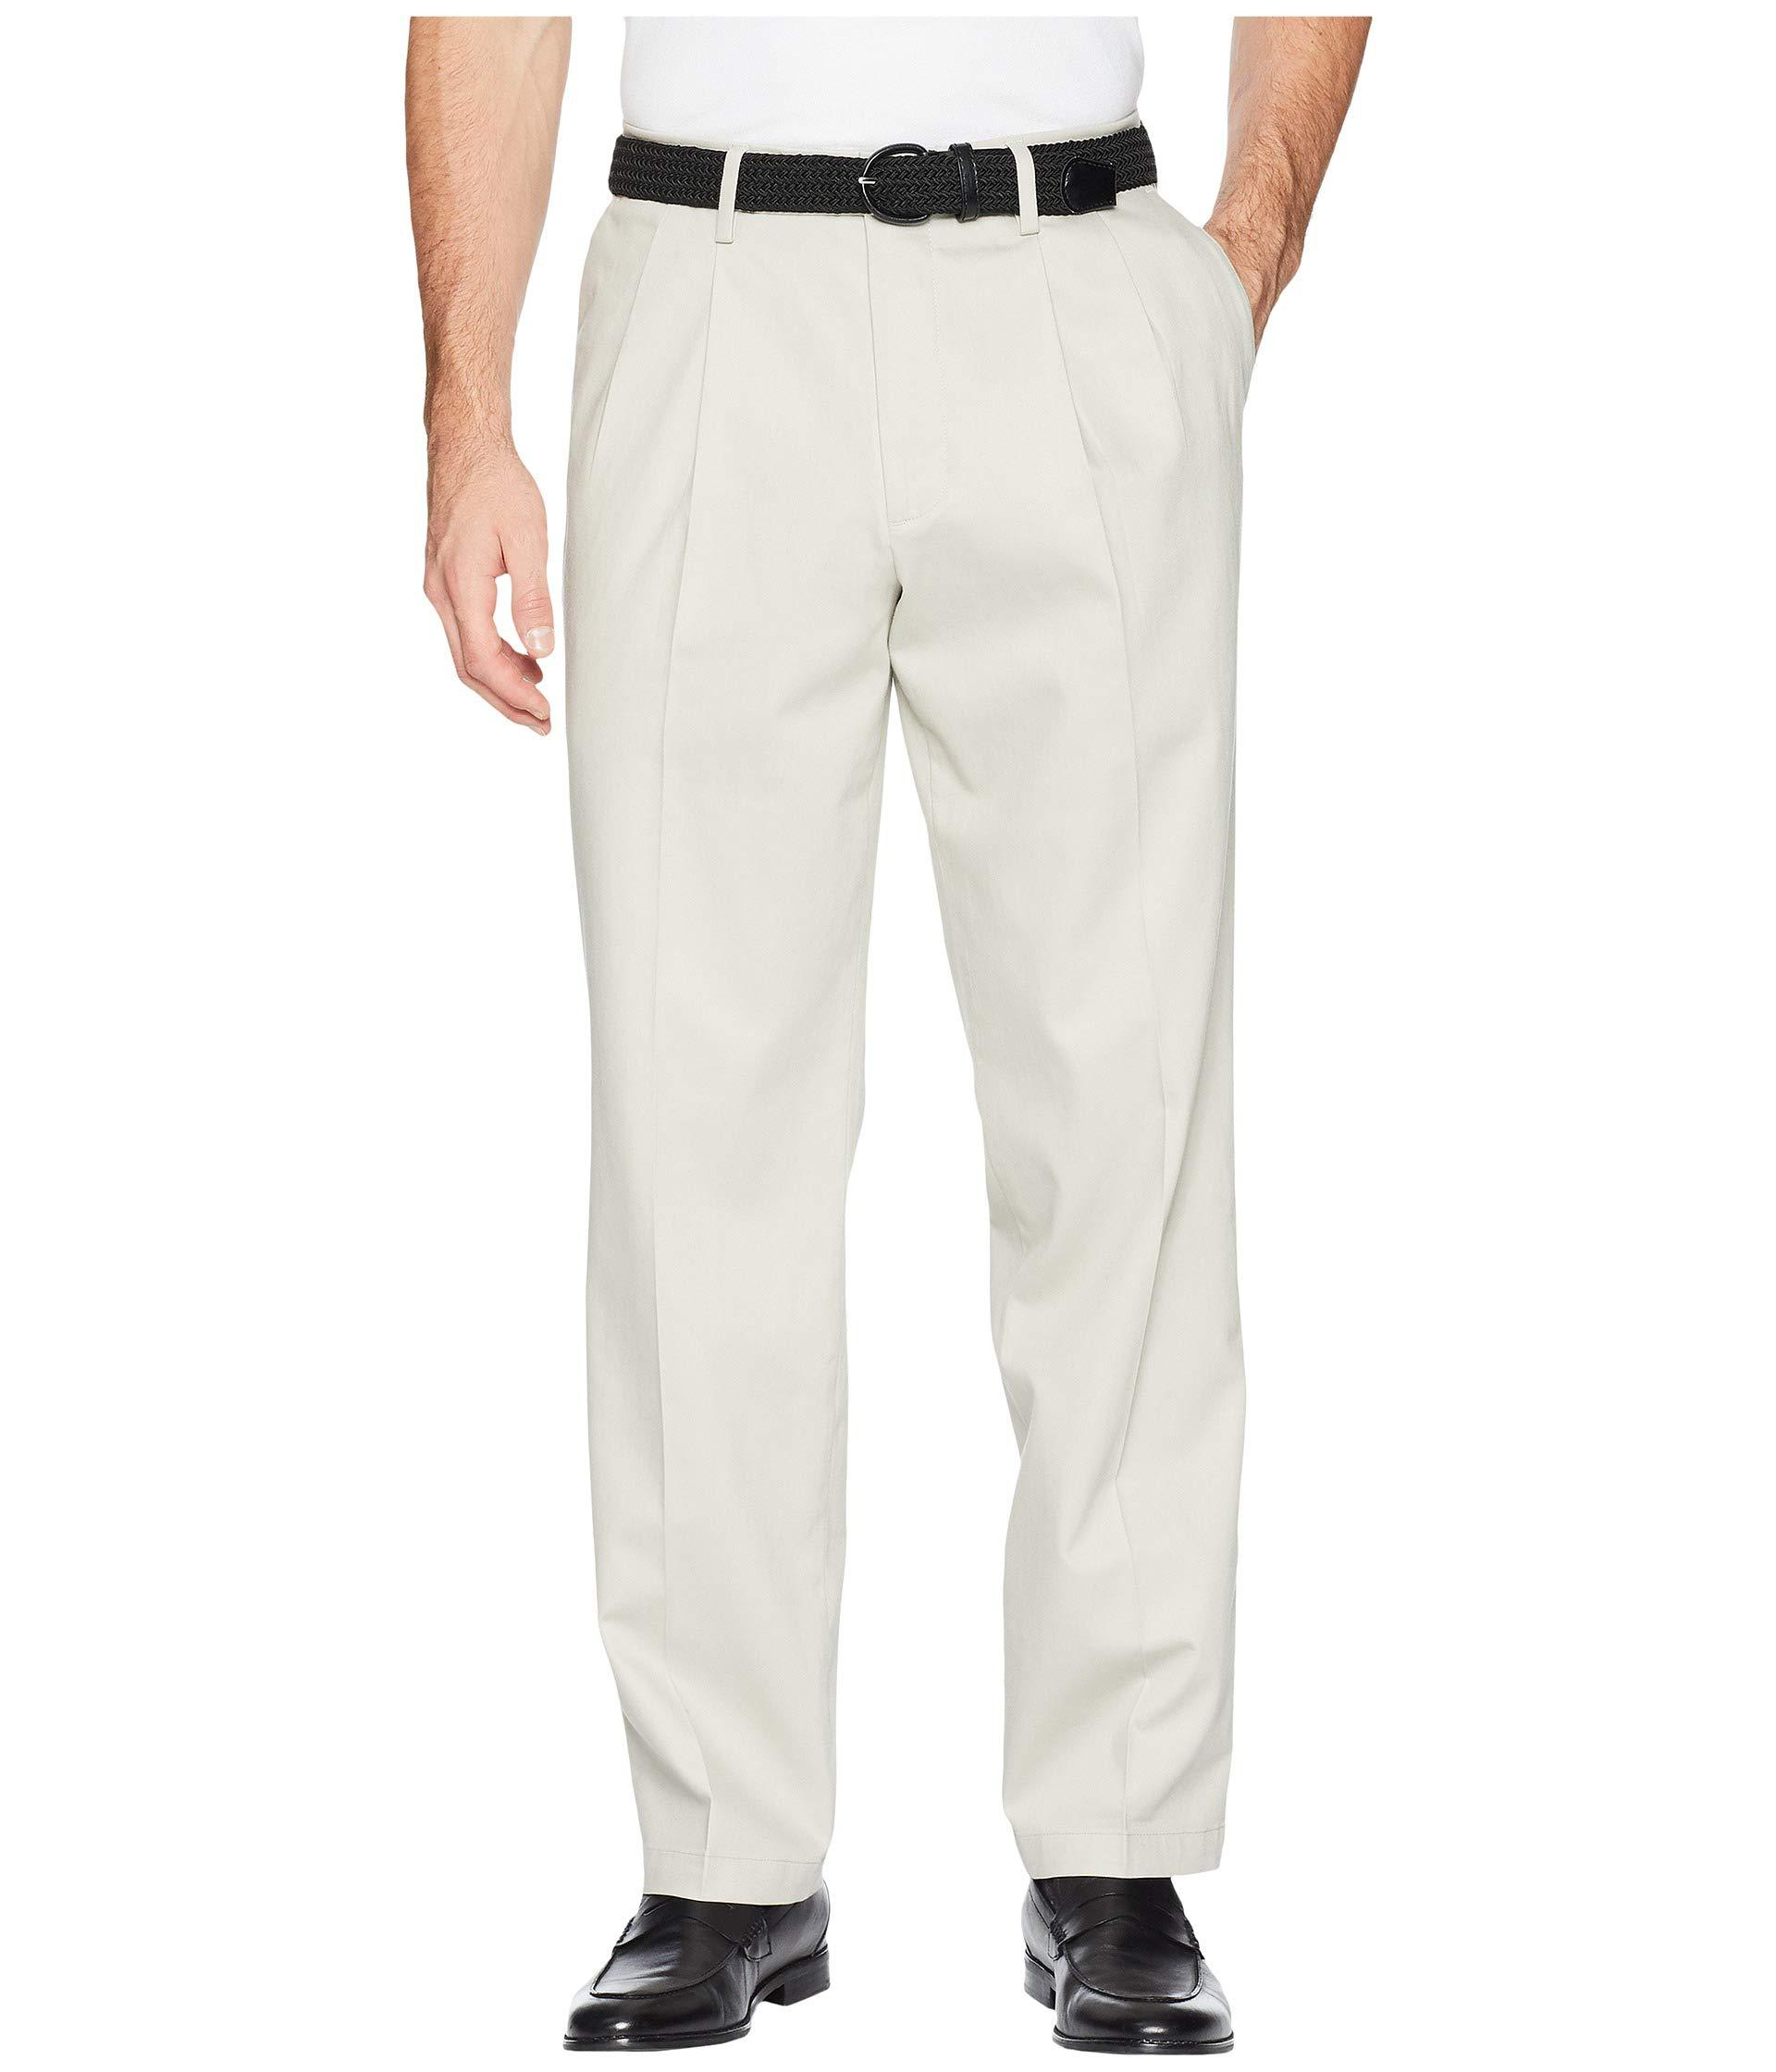 588c9fed Dockers. Natural Classic Fit Signature Khaki Lux Cotton Stretch Pants ...